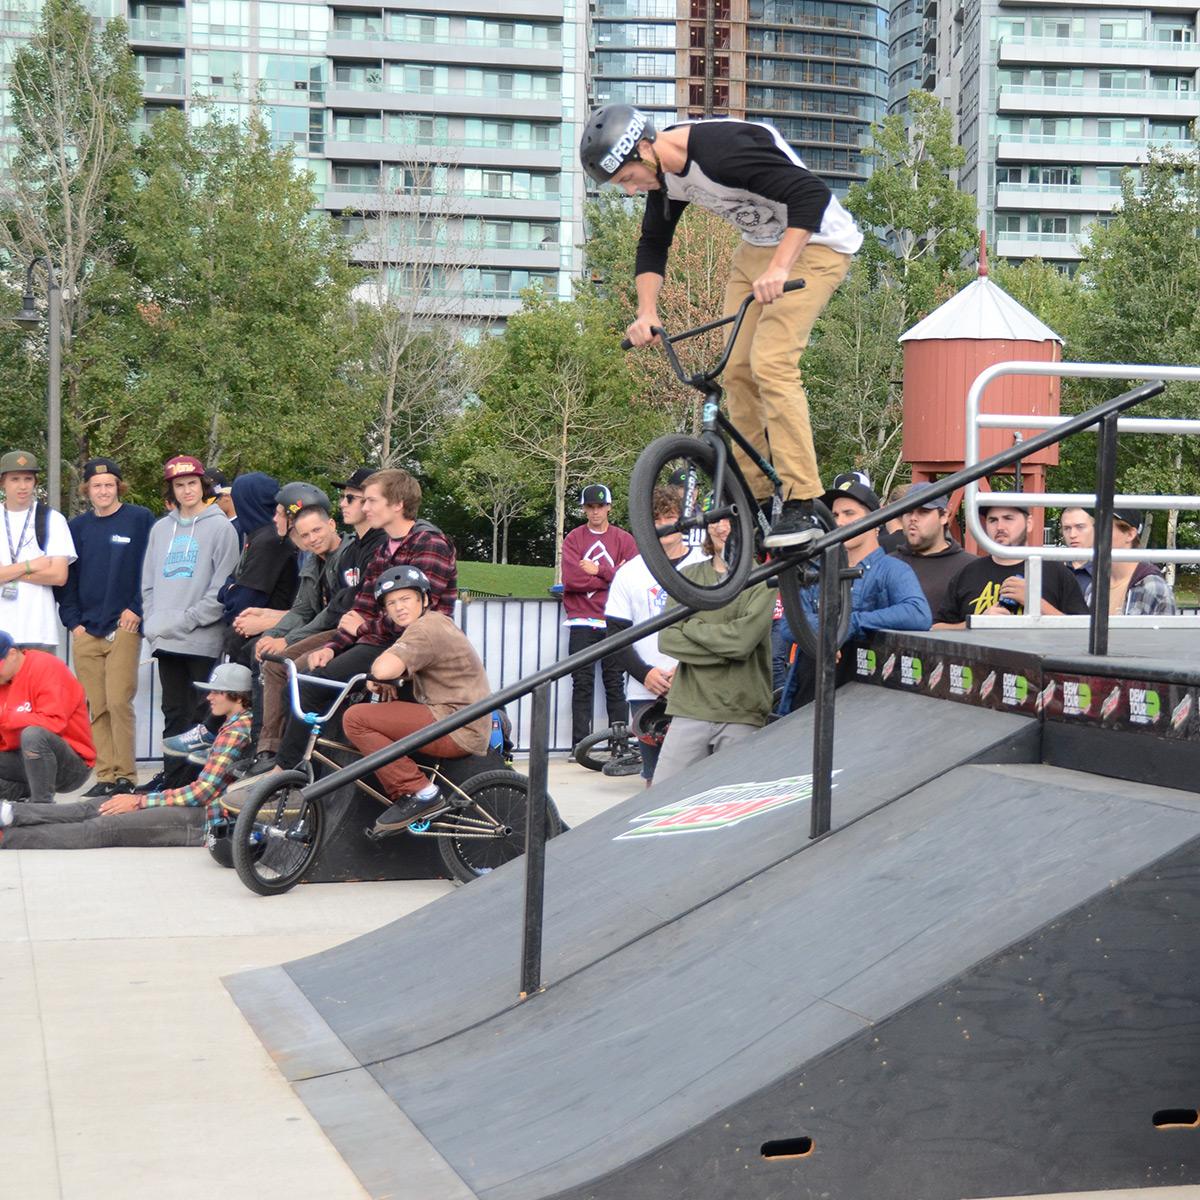 Crank Arm Grind at BMX Dew Tour Am Series in Toronto